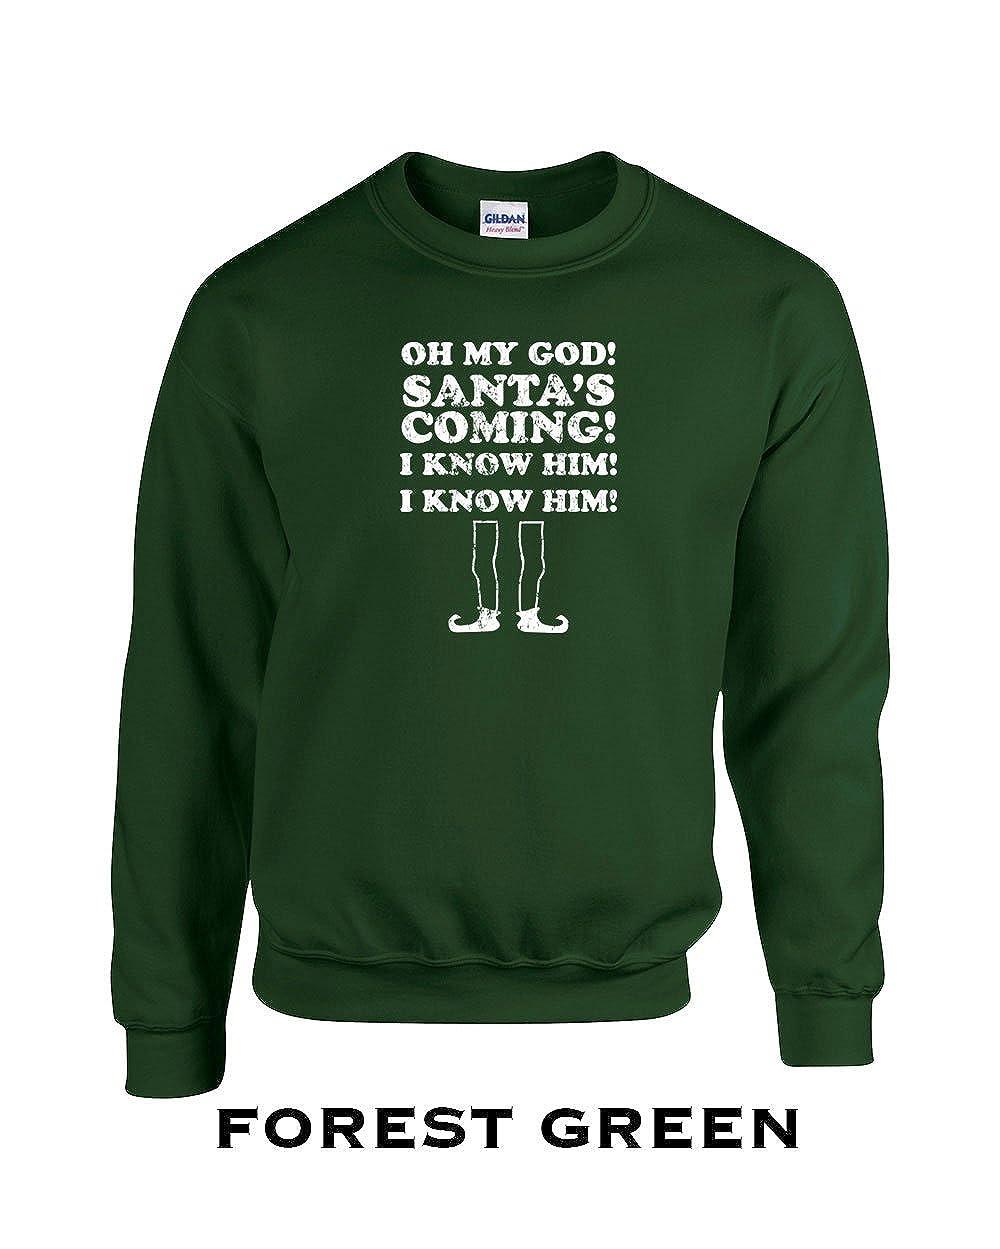 367 Santa is Coming I know Him Funny Adult Crew Sweatshirt